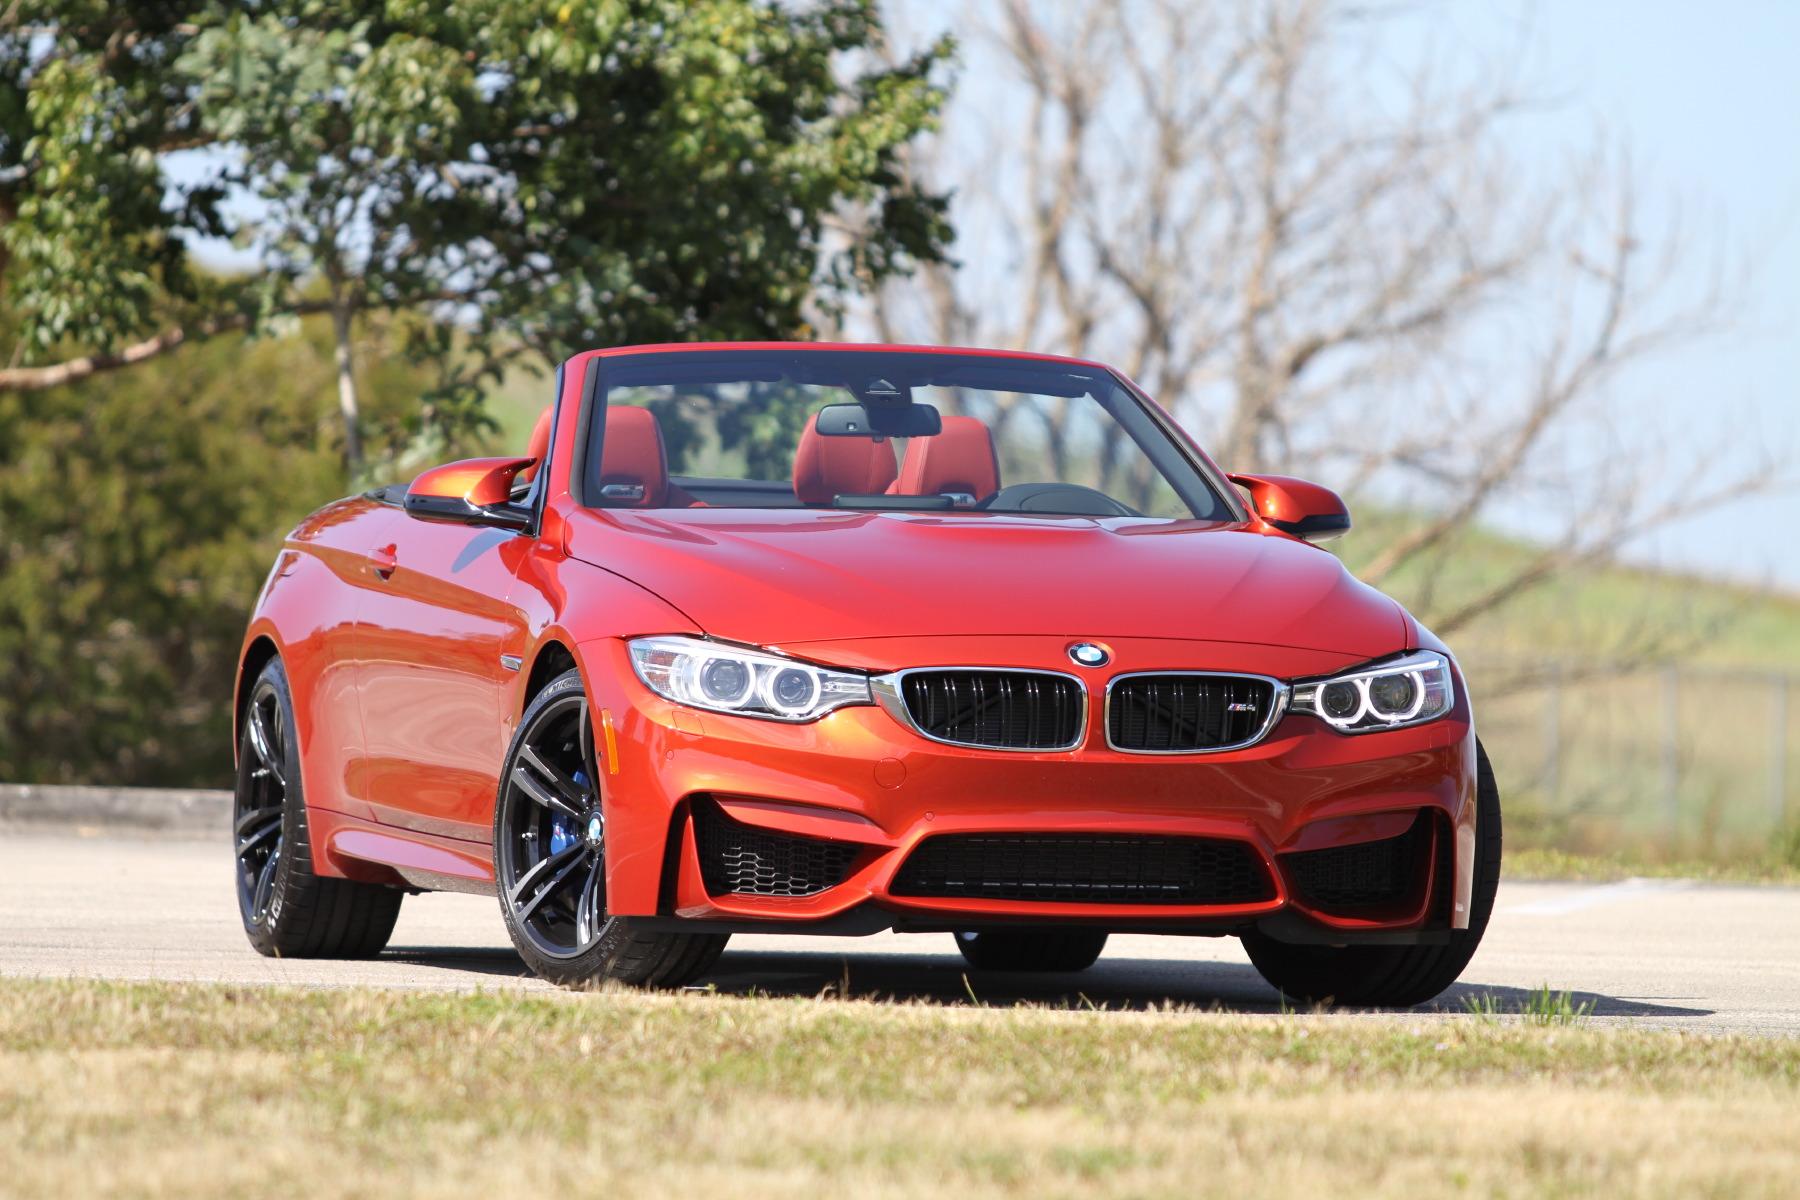 BMW M Convertible Mile MPH Testing DragTimescom - 2015 bmw m4 convertible price